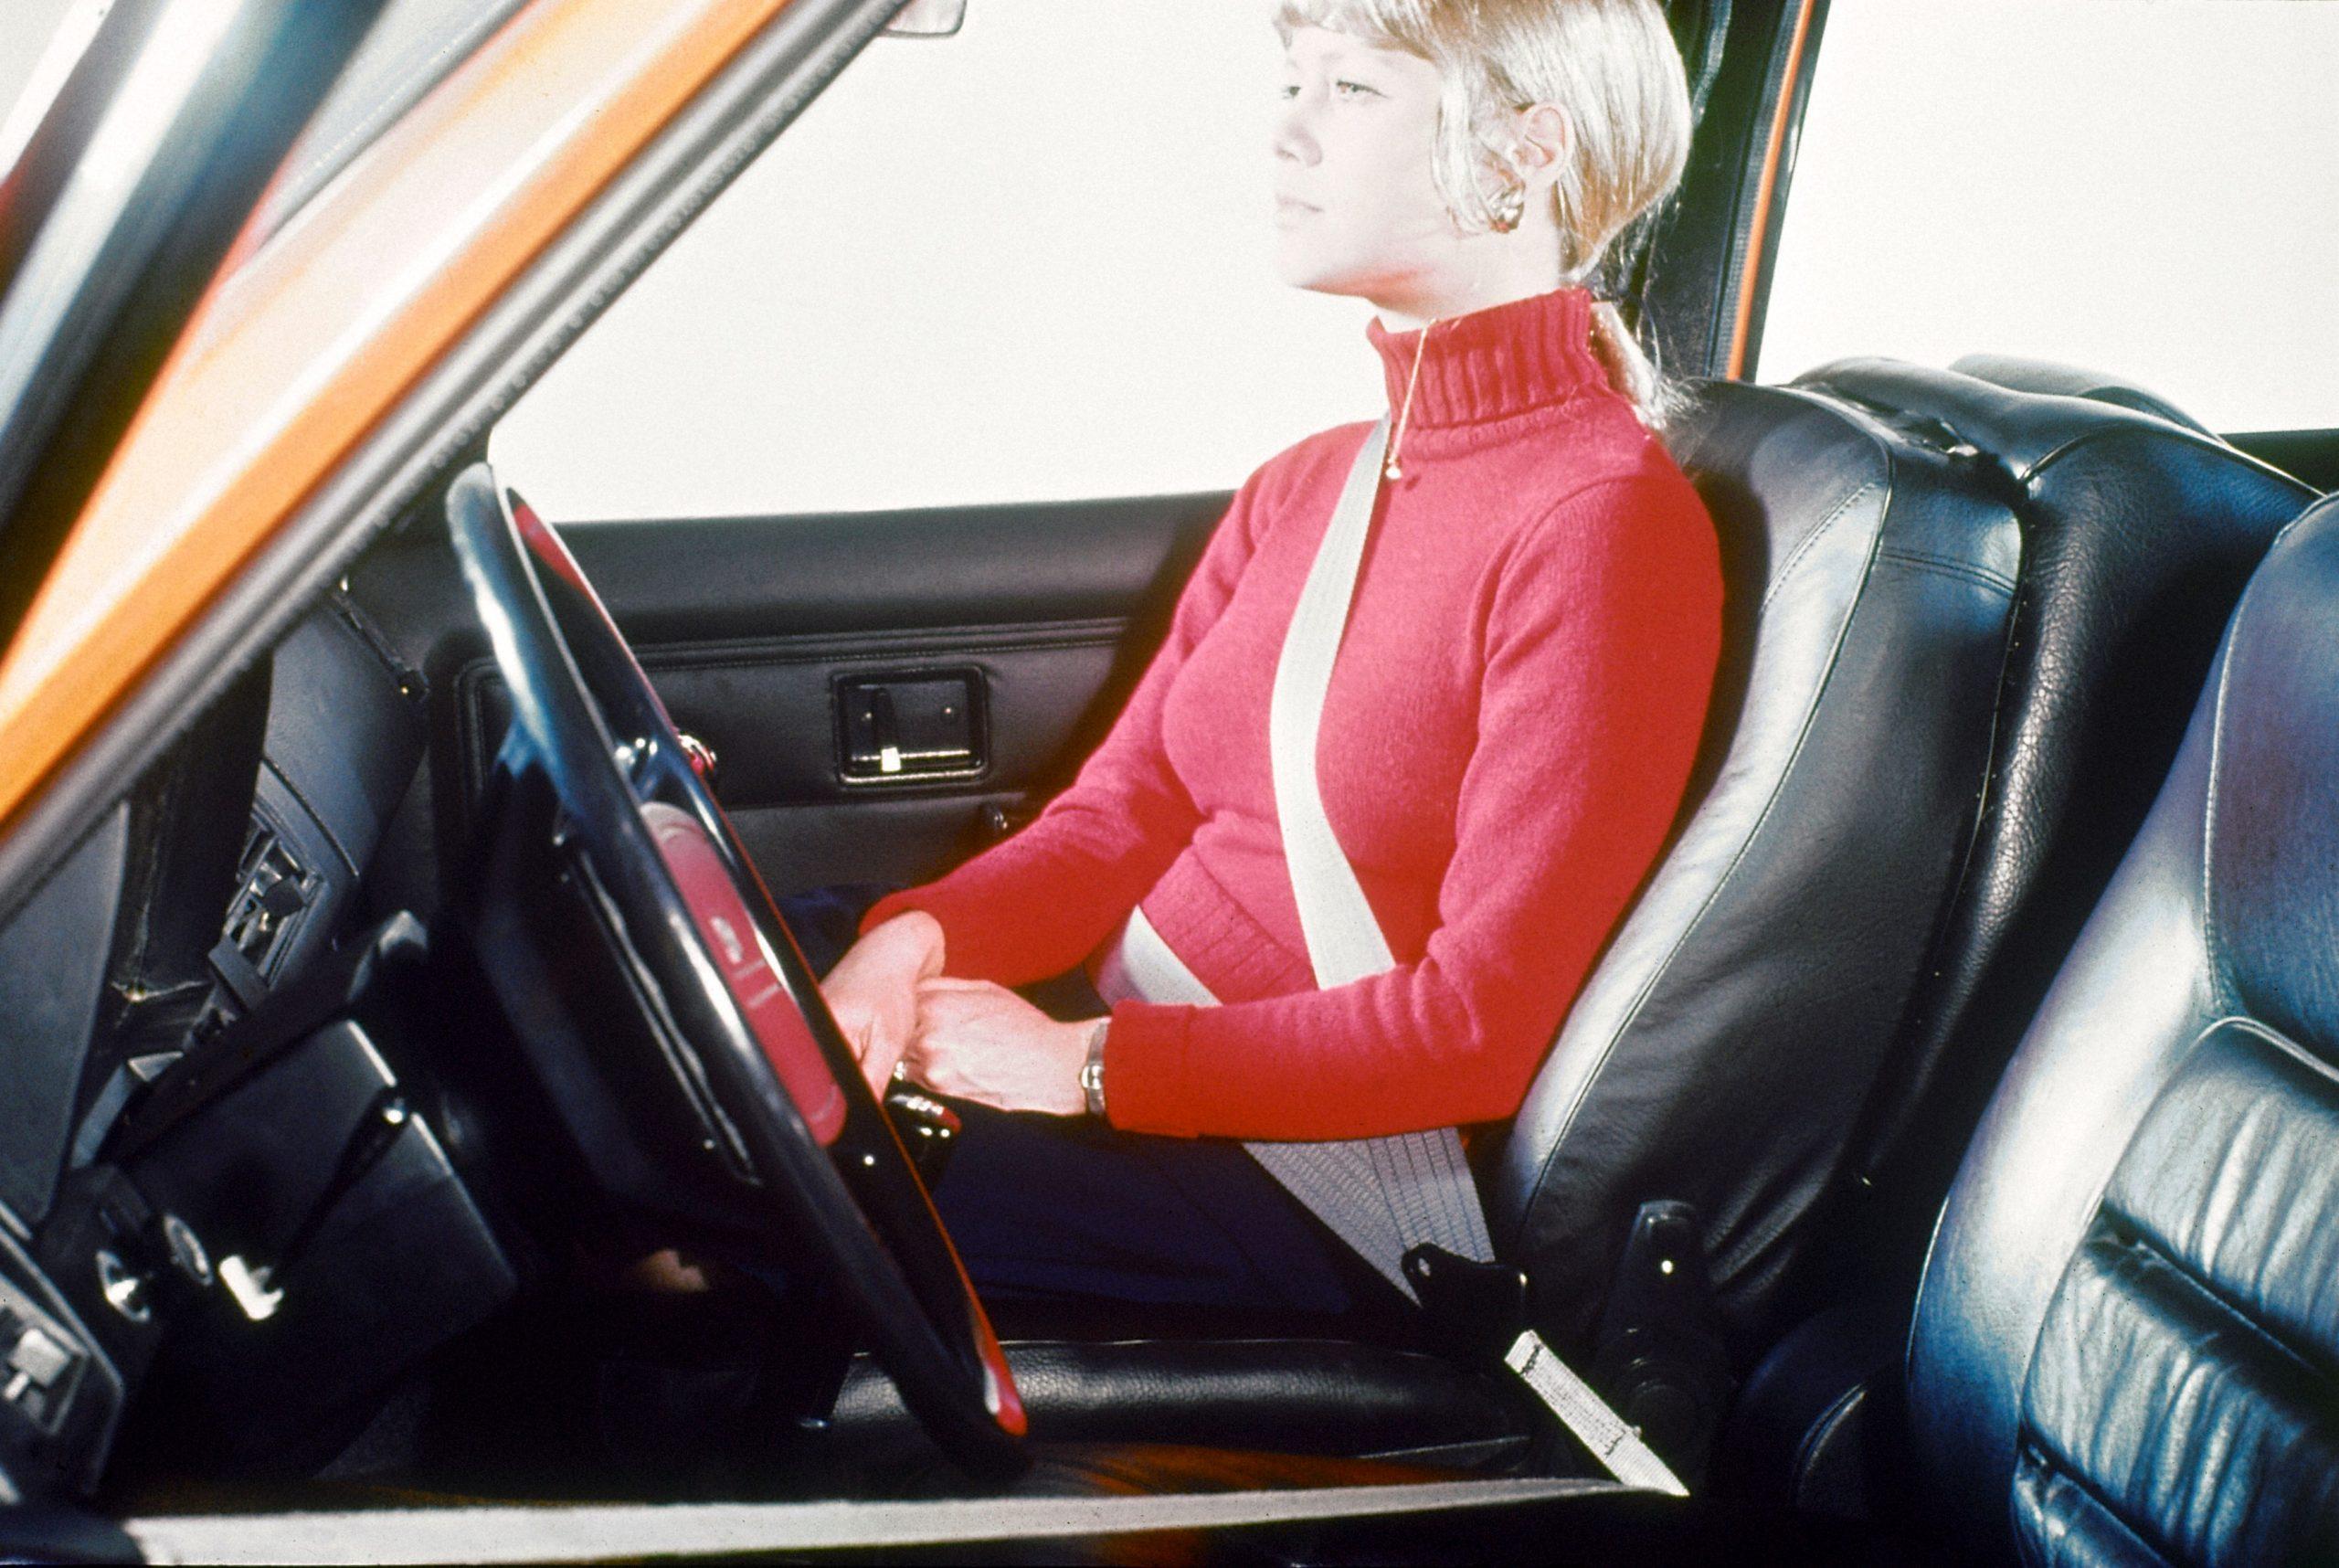 safety equipment passenger